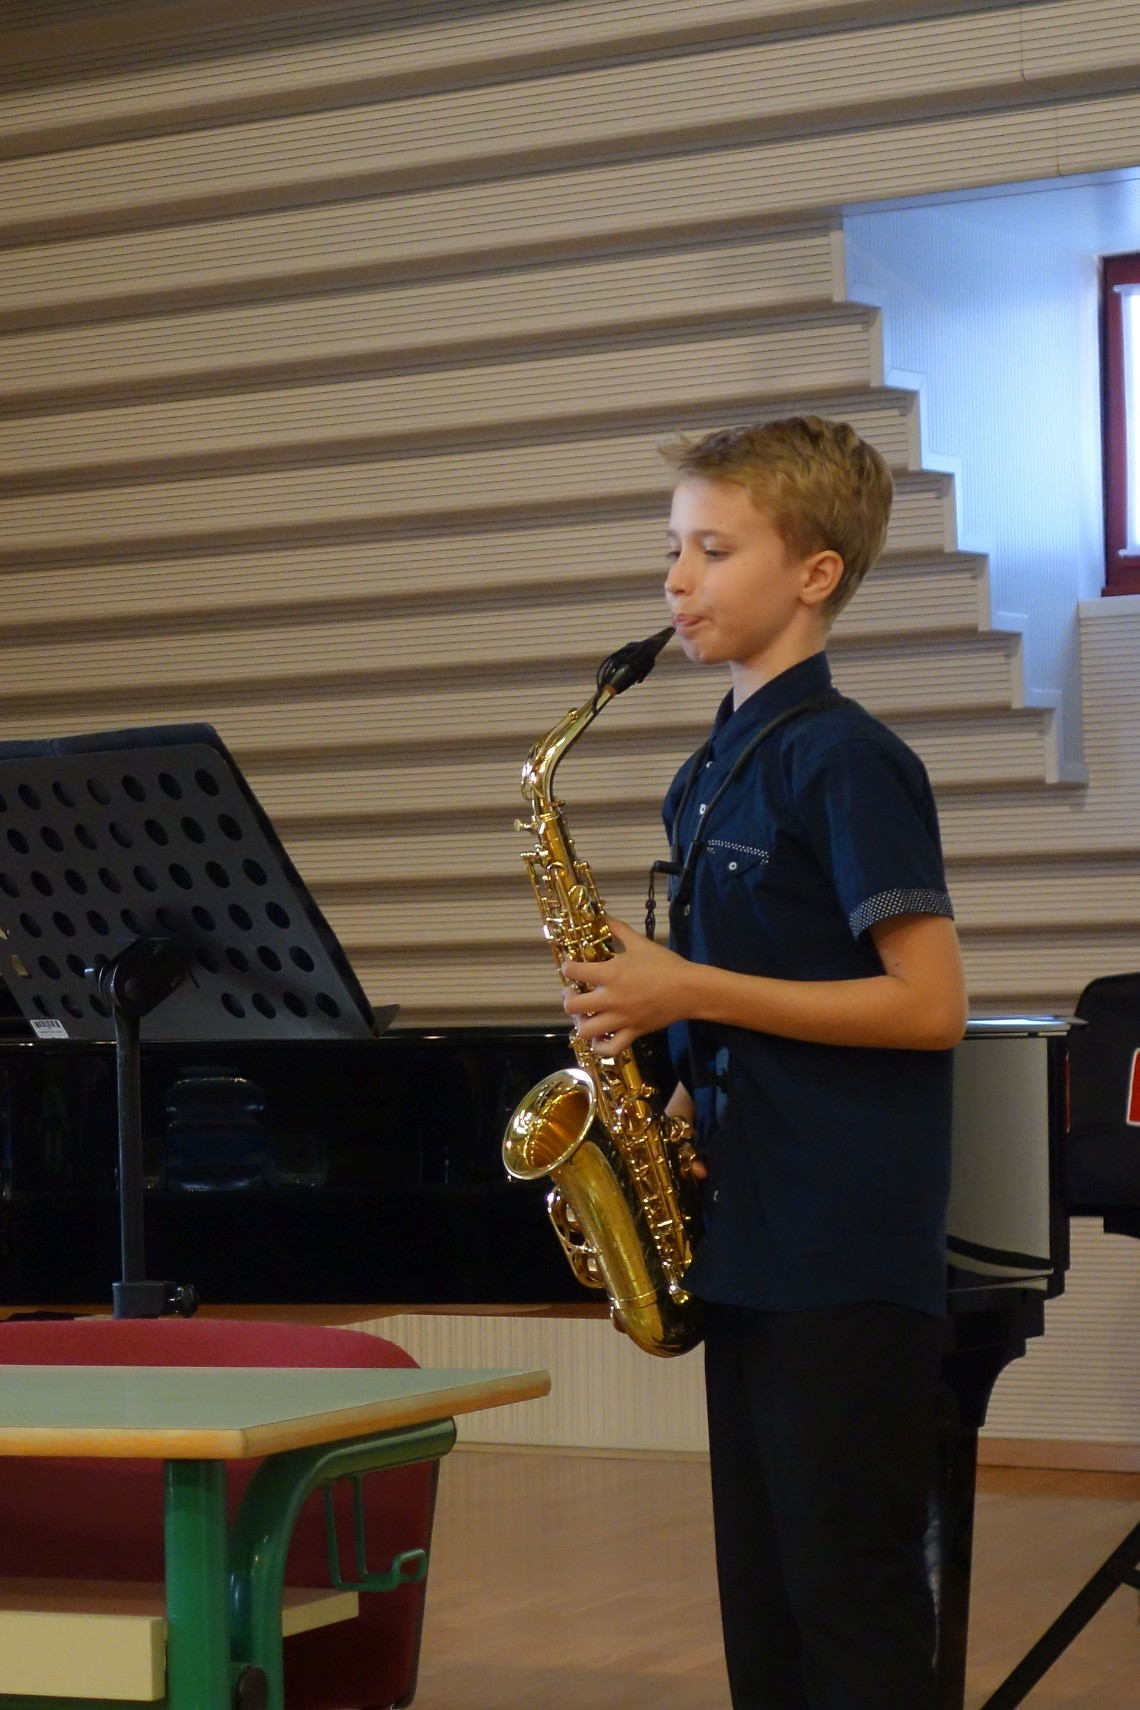 Anže Klančar Jurijavčič, saksofon  mentor: Bojan Zupančič, korepetitor: David Trebižan